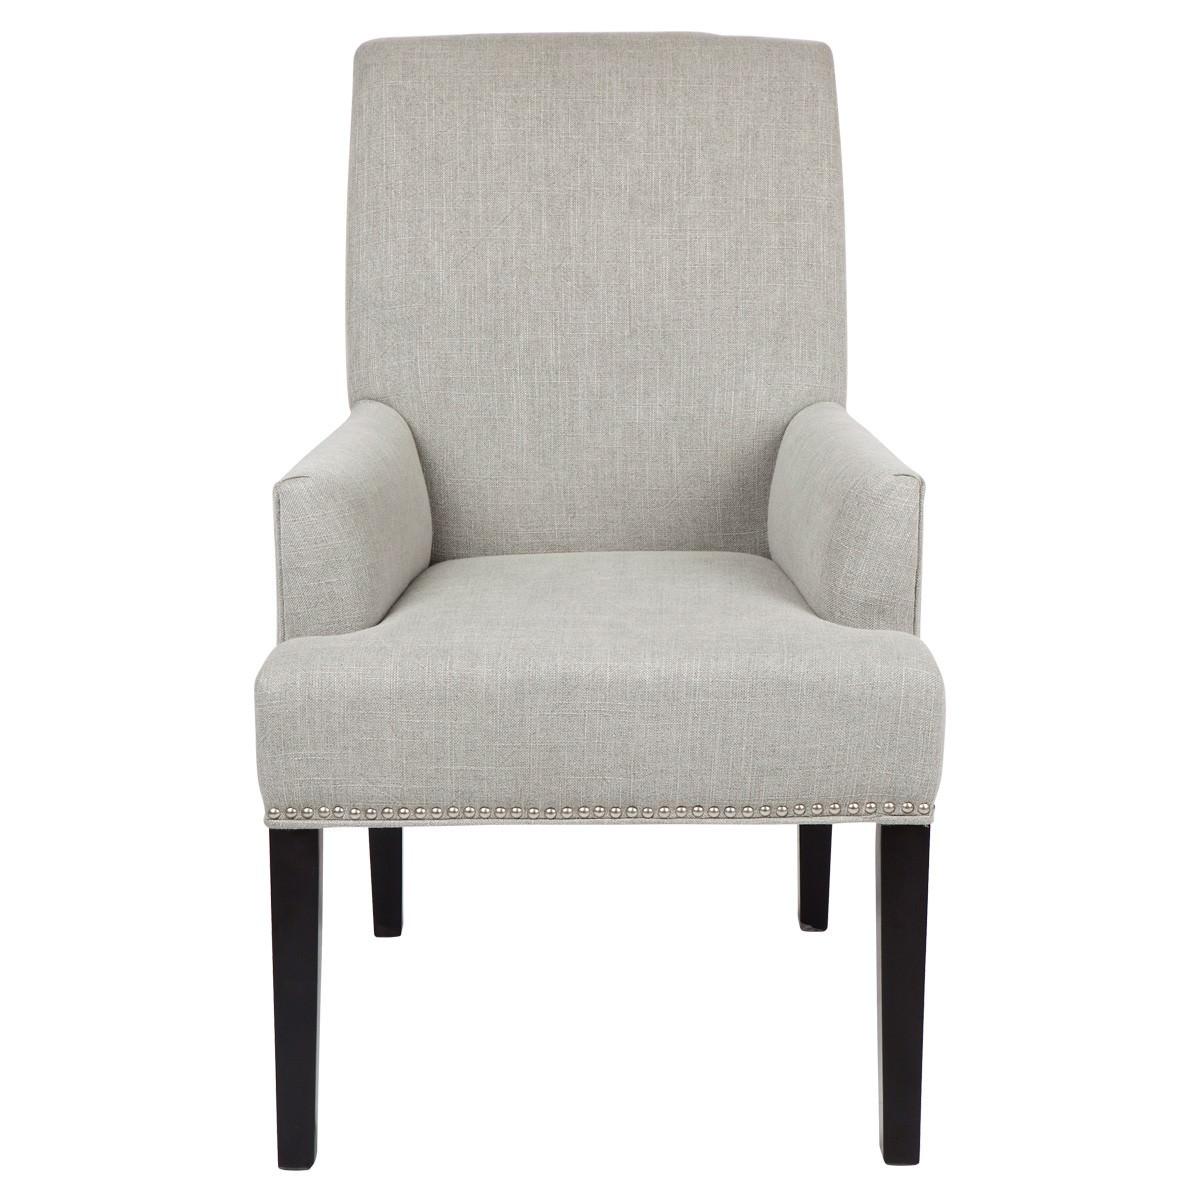 Bentley Fabric Dining Armchair, Grey